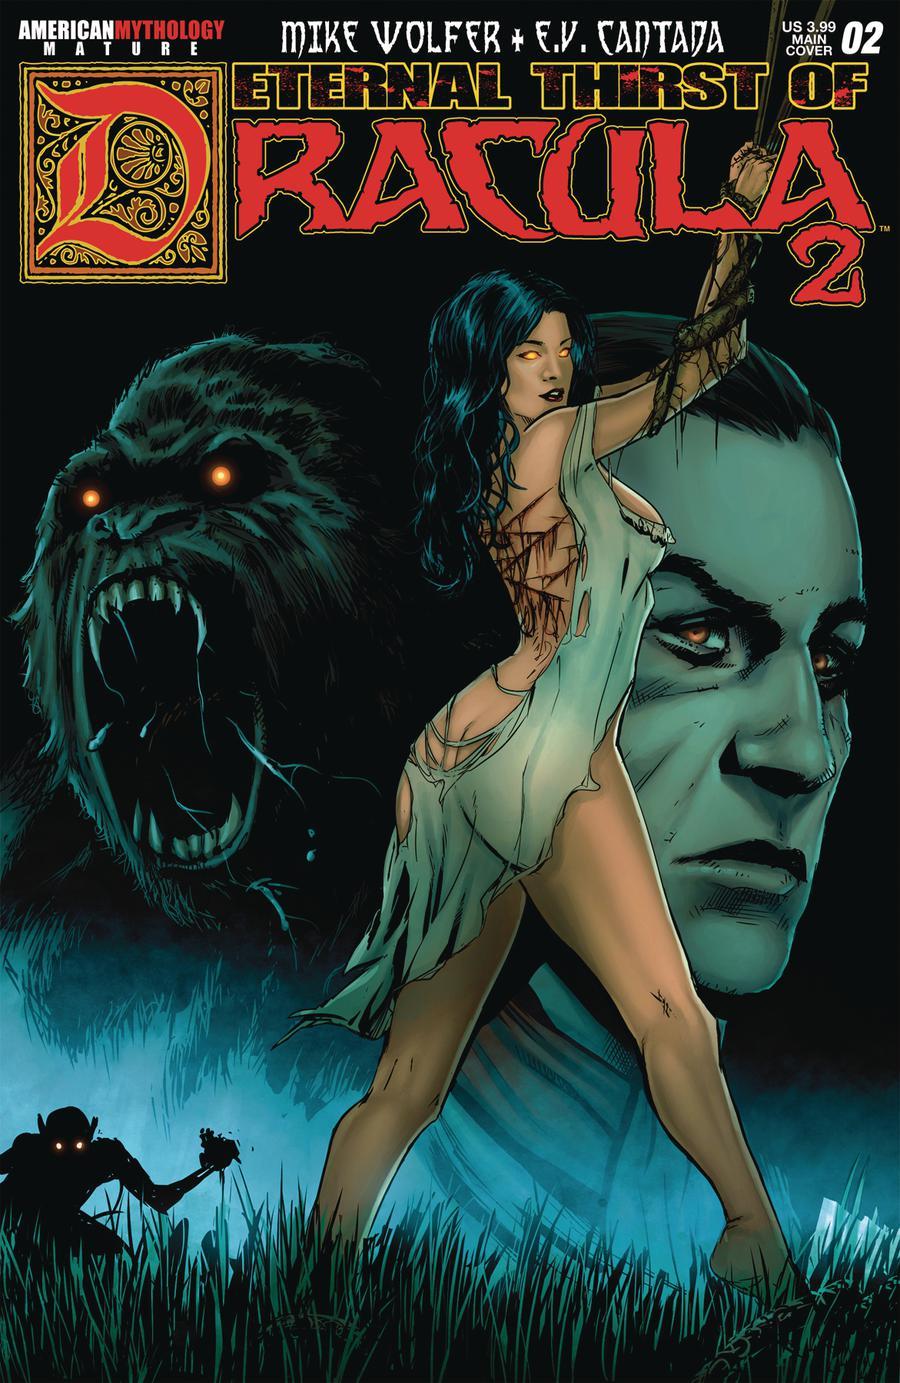 Eternal Thirst Of Dracula Book 2 #2 Cover A Regular Jomar Bulda Cover